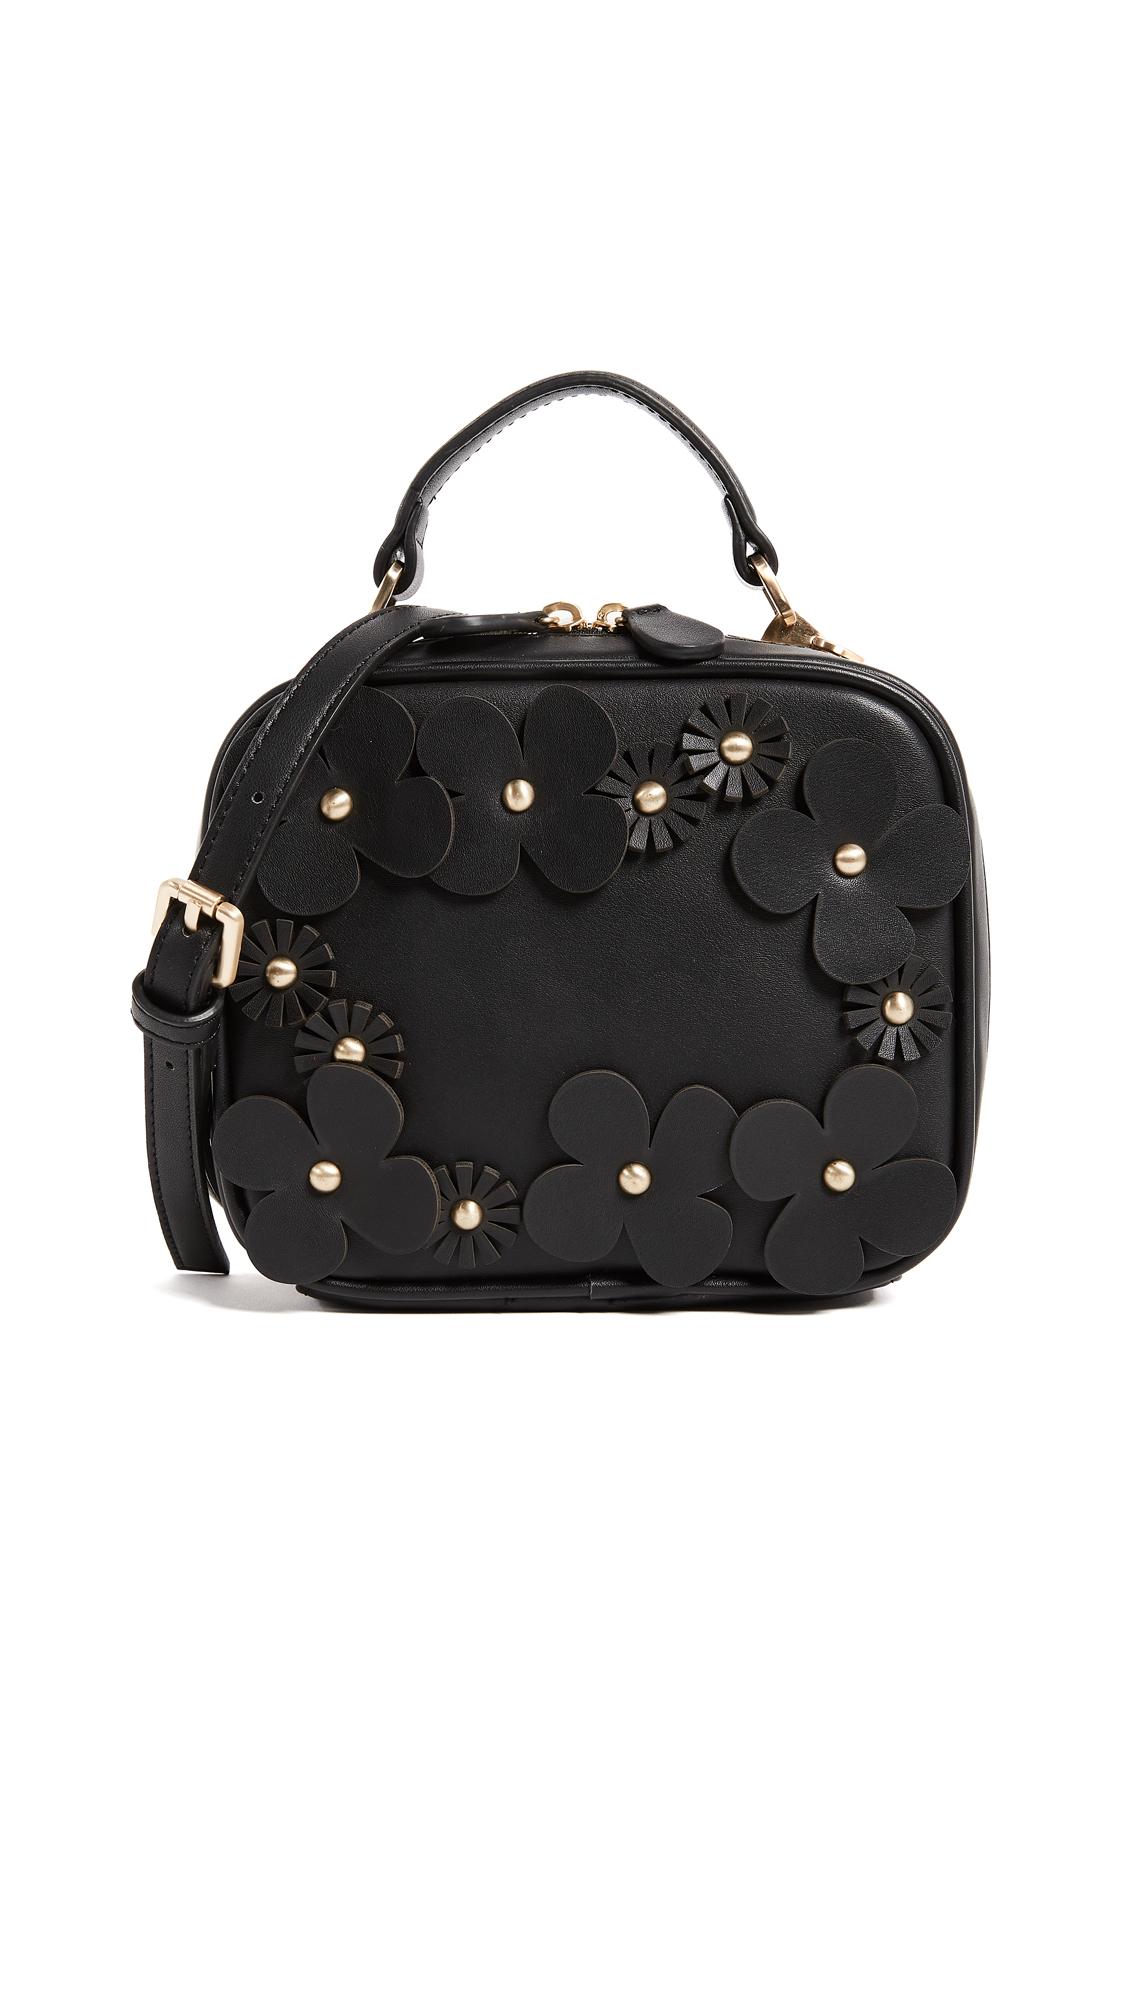 Studio 33 Floral Applique Box Bag - Black